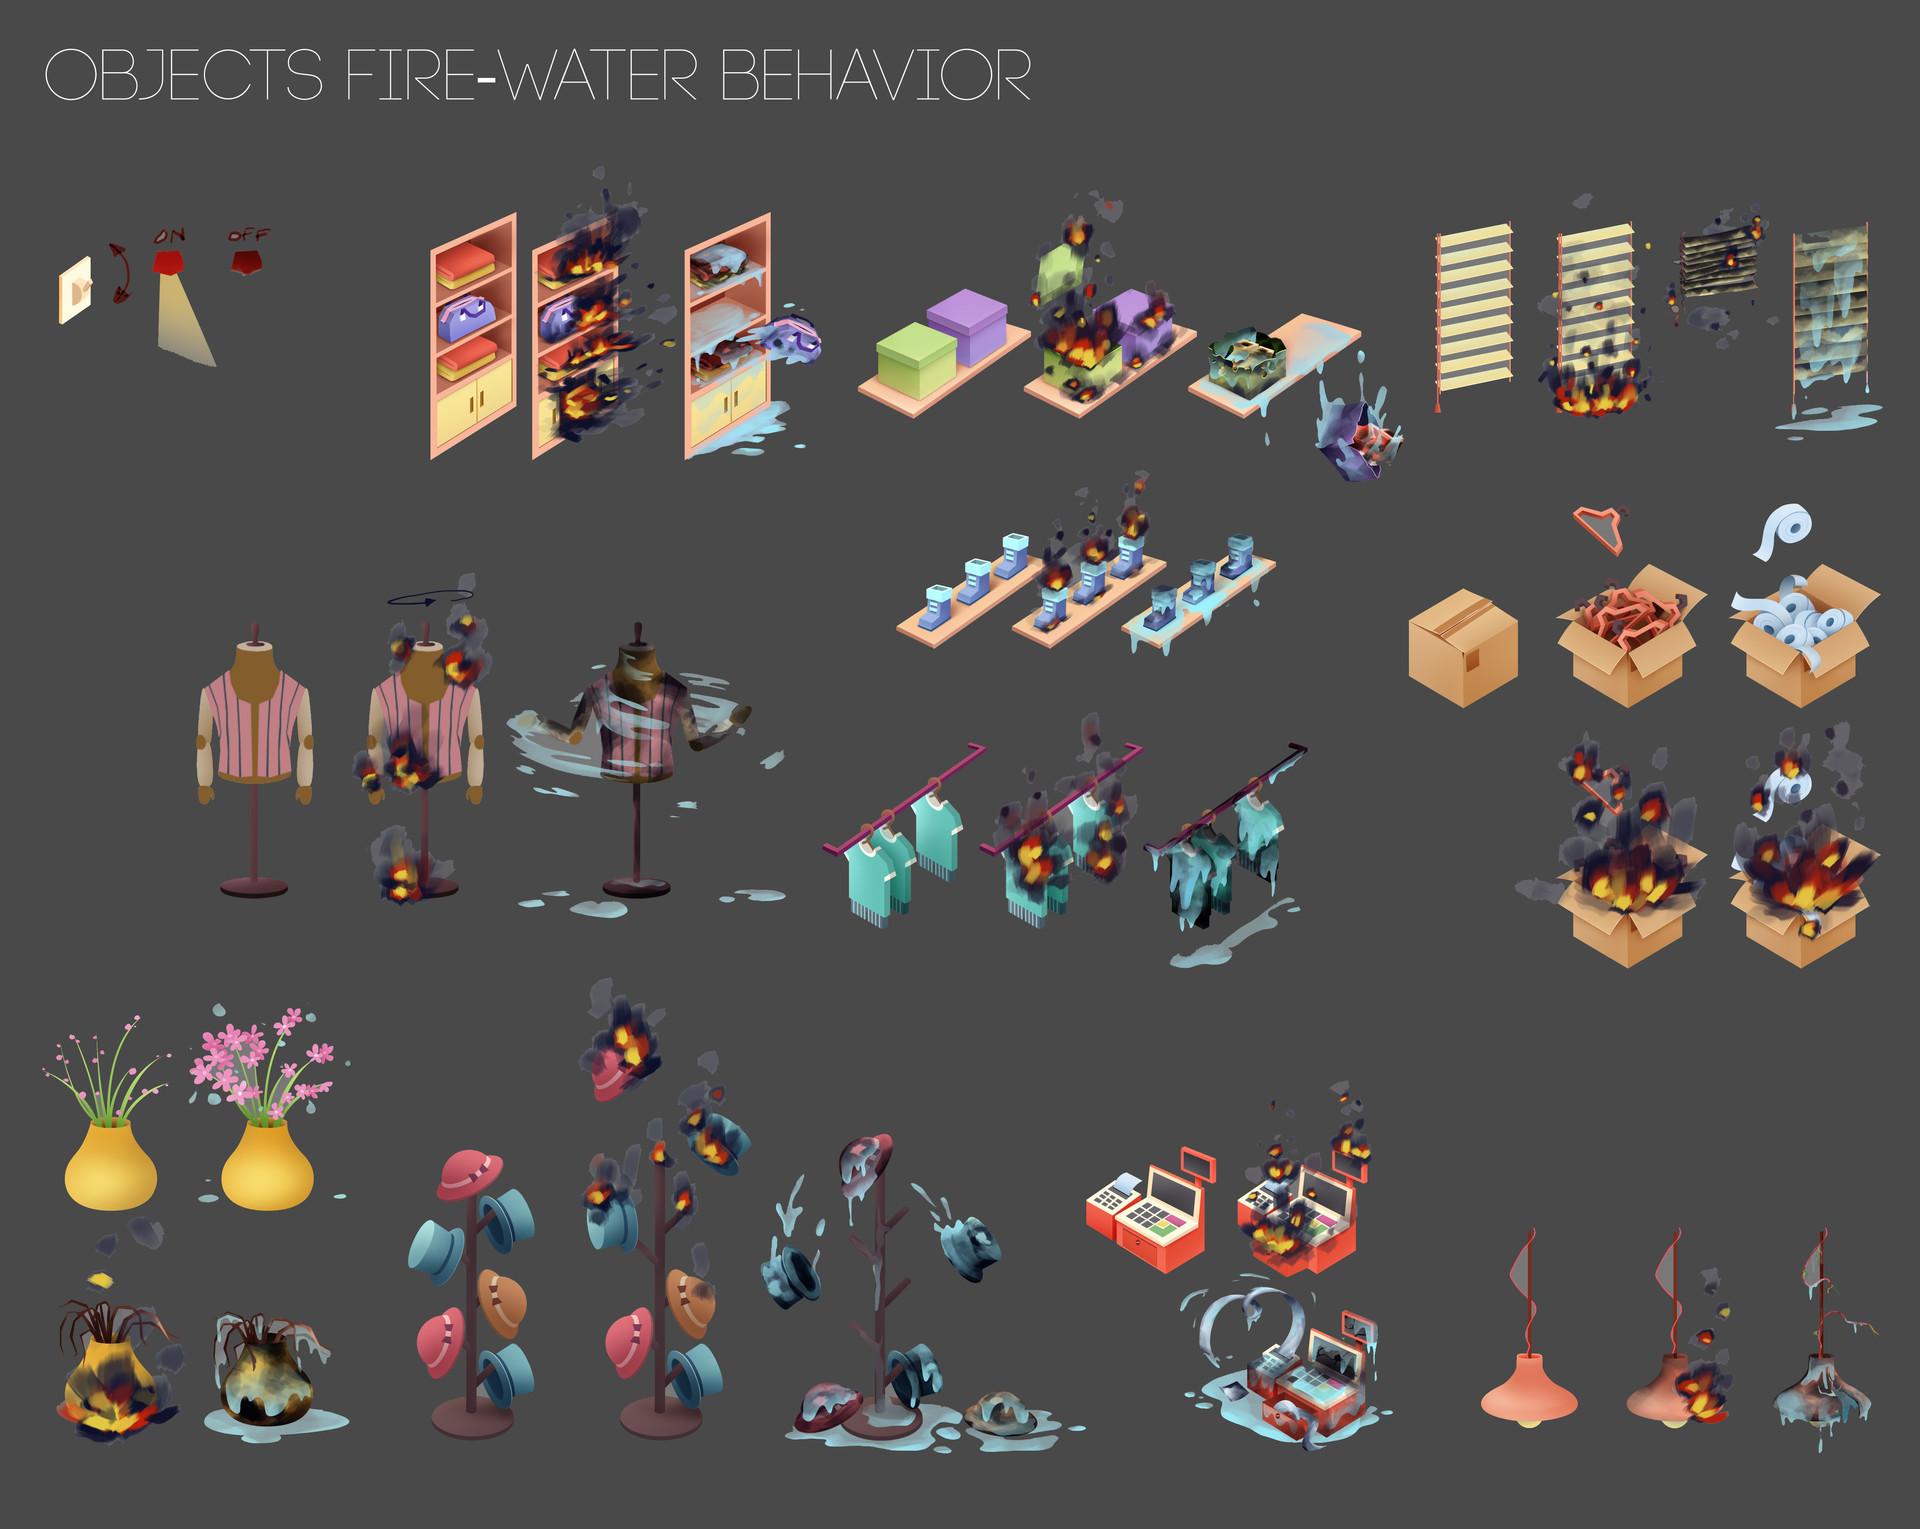 Thu phan artstation objectsfirewaterbehavior